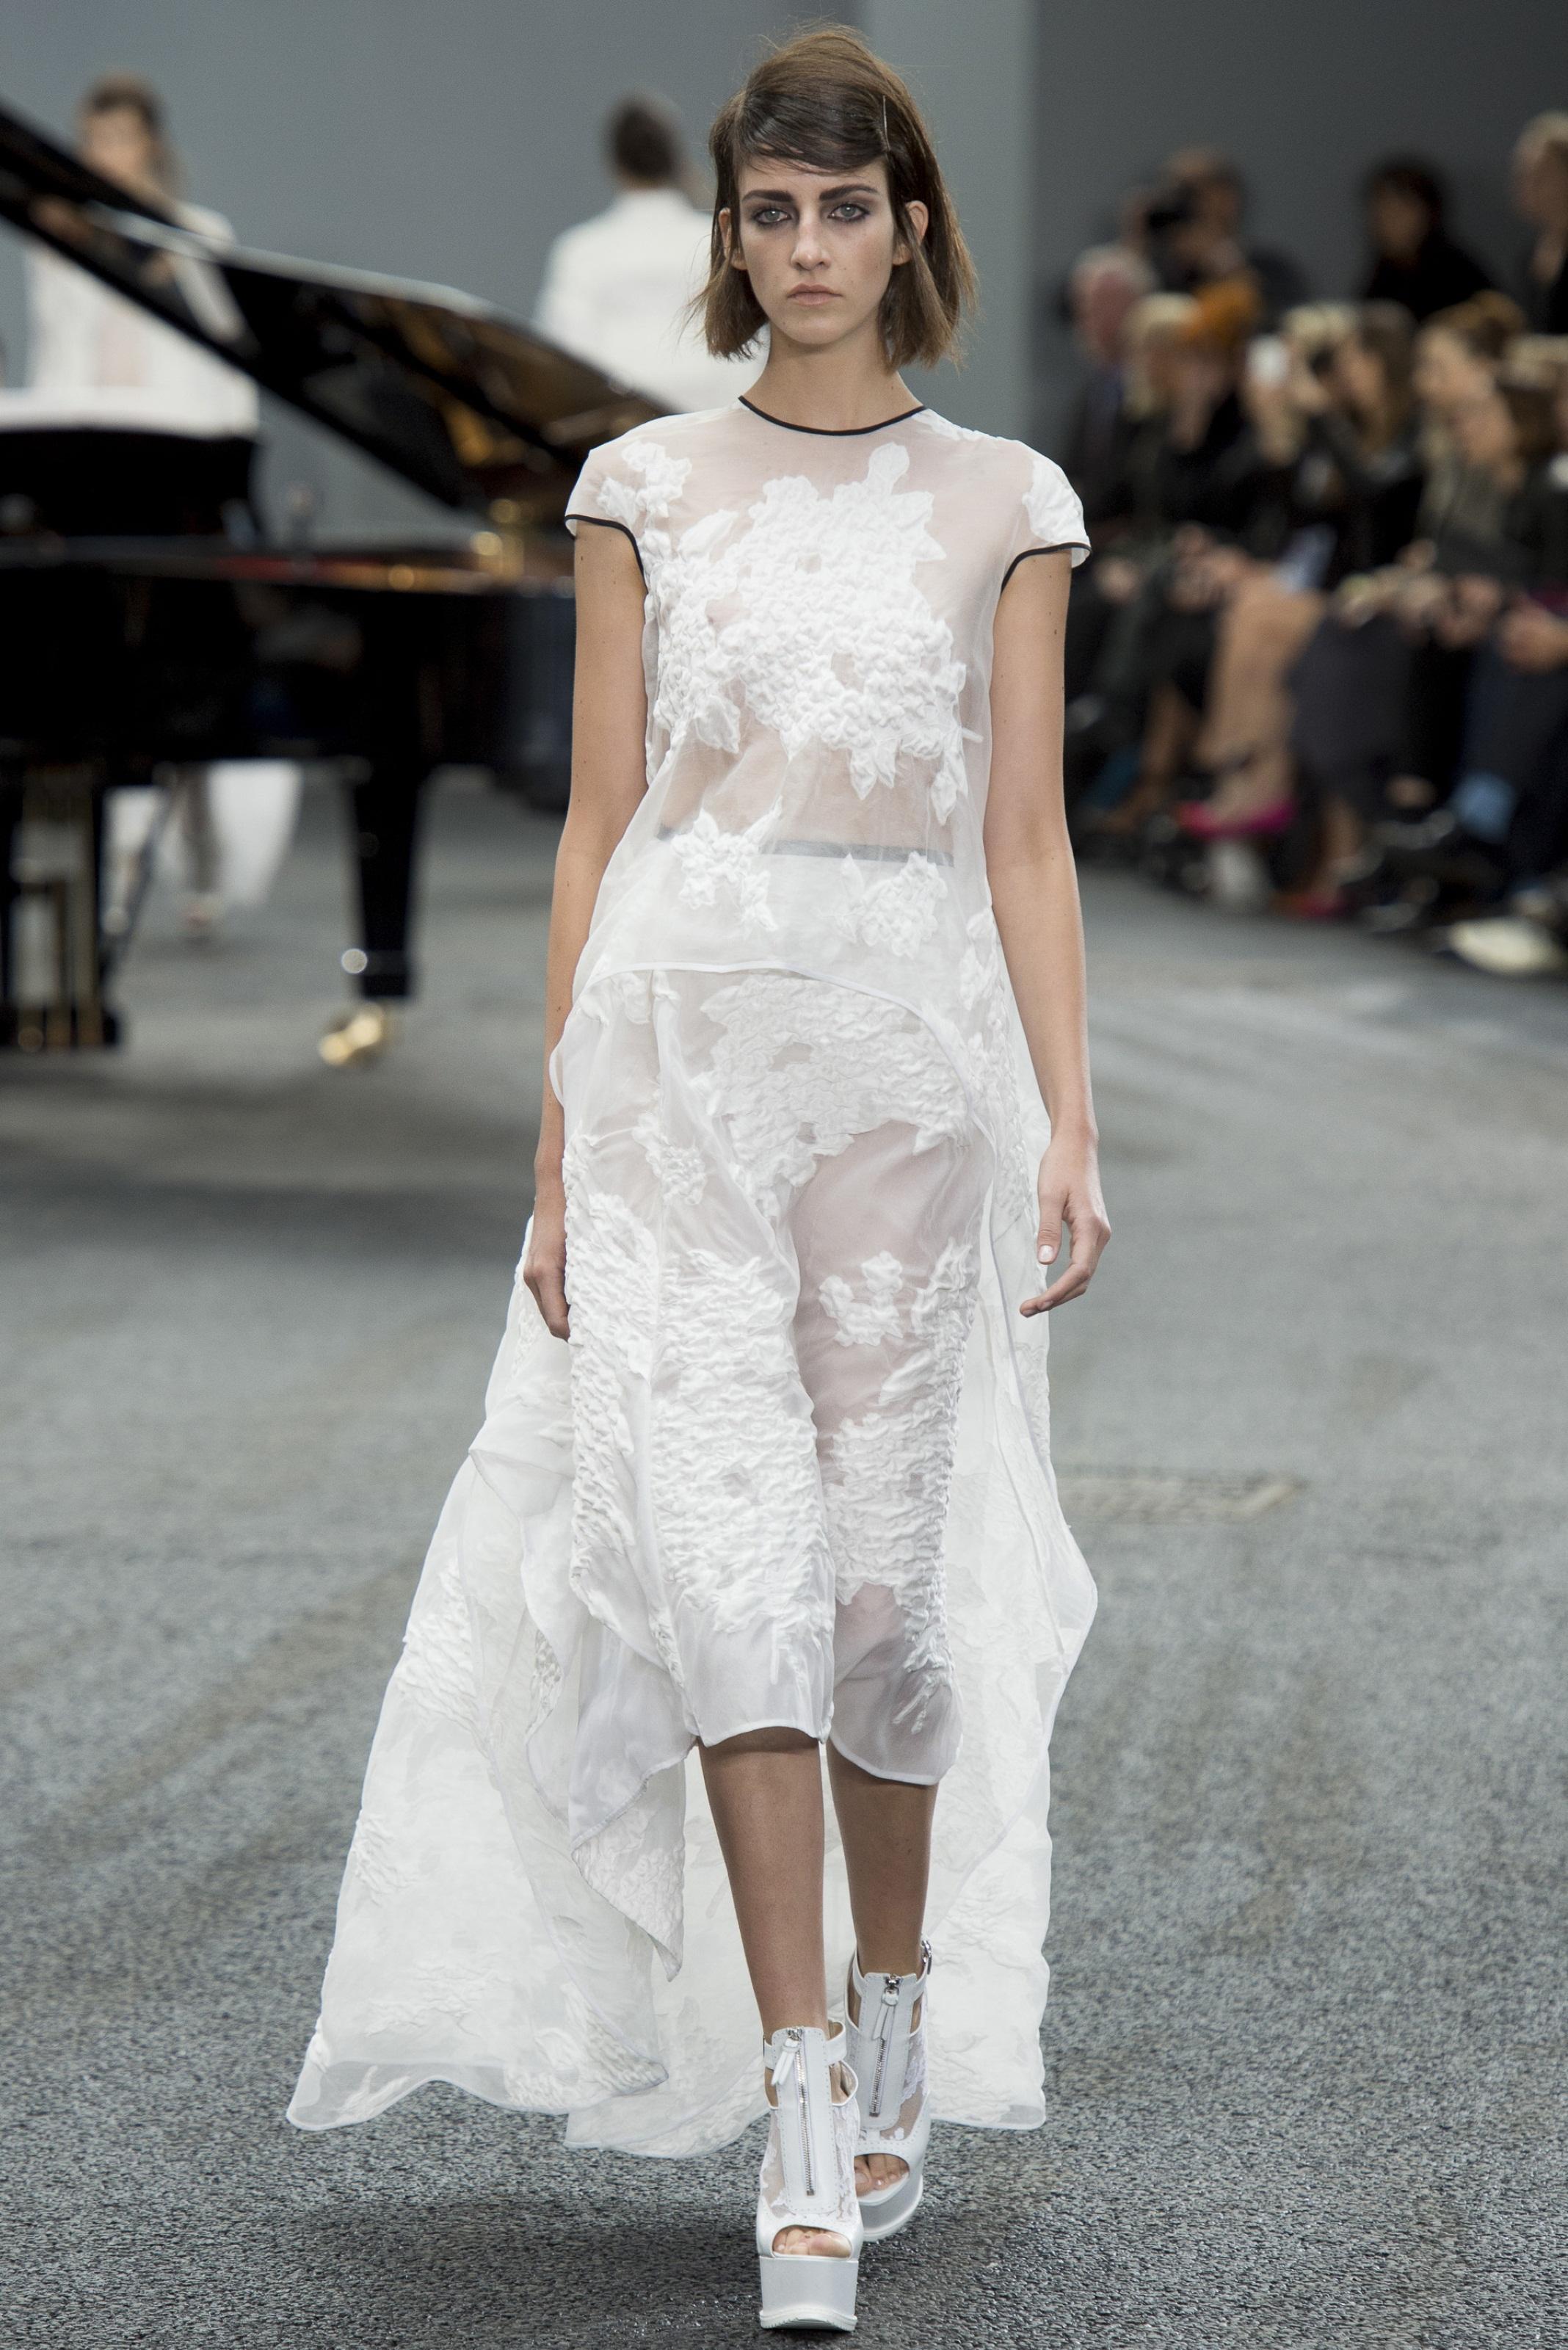 00180 h 20130916175500 00180h for Wedding dresses for tomboy brides